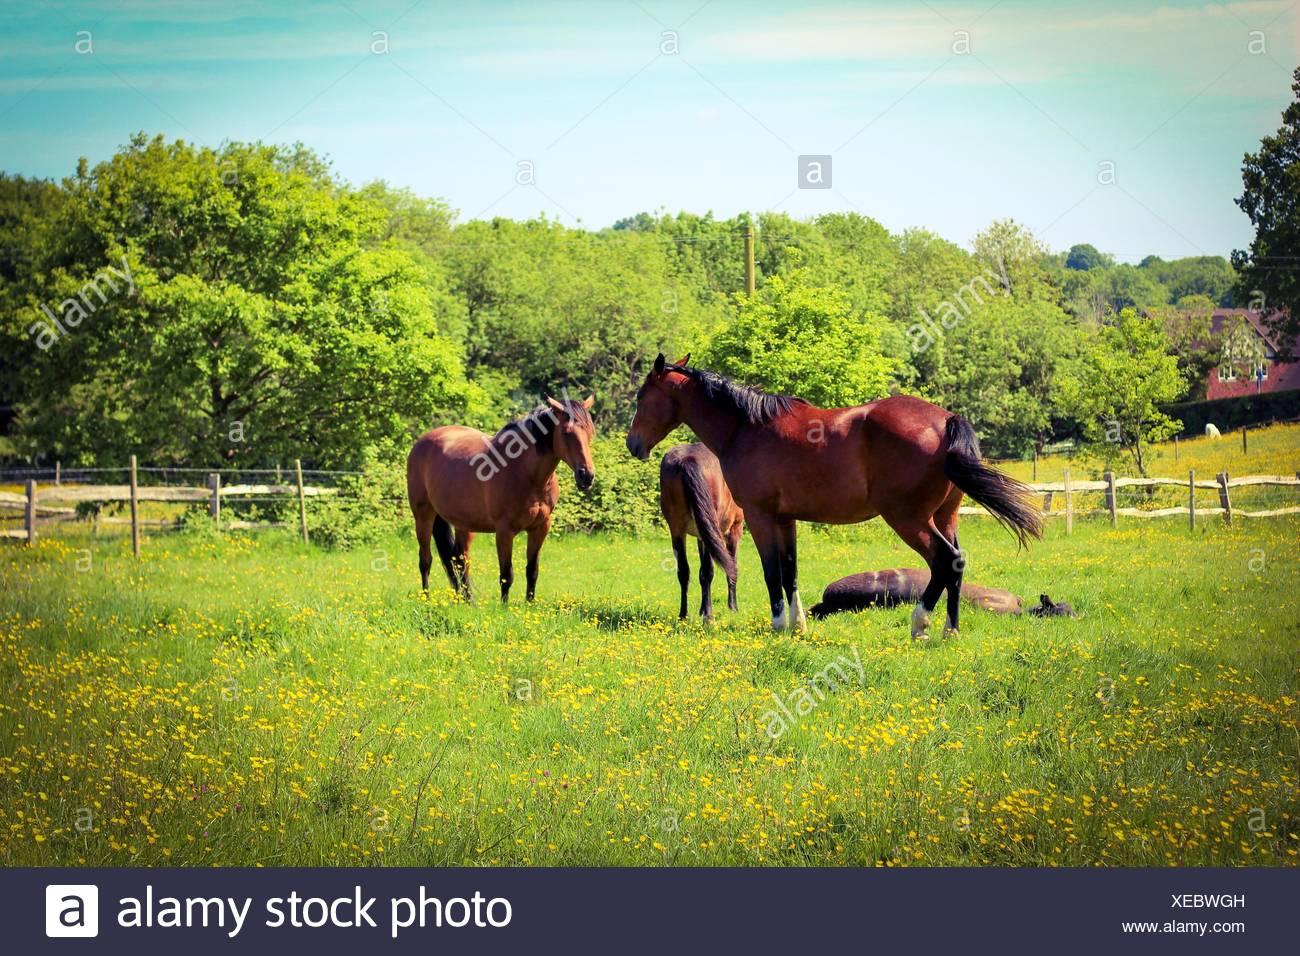 hayfield - Stock Image